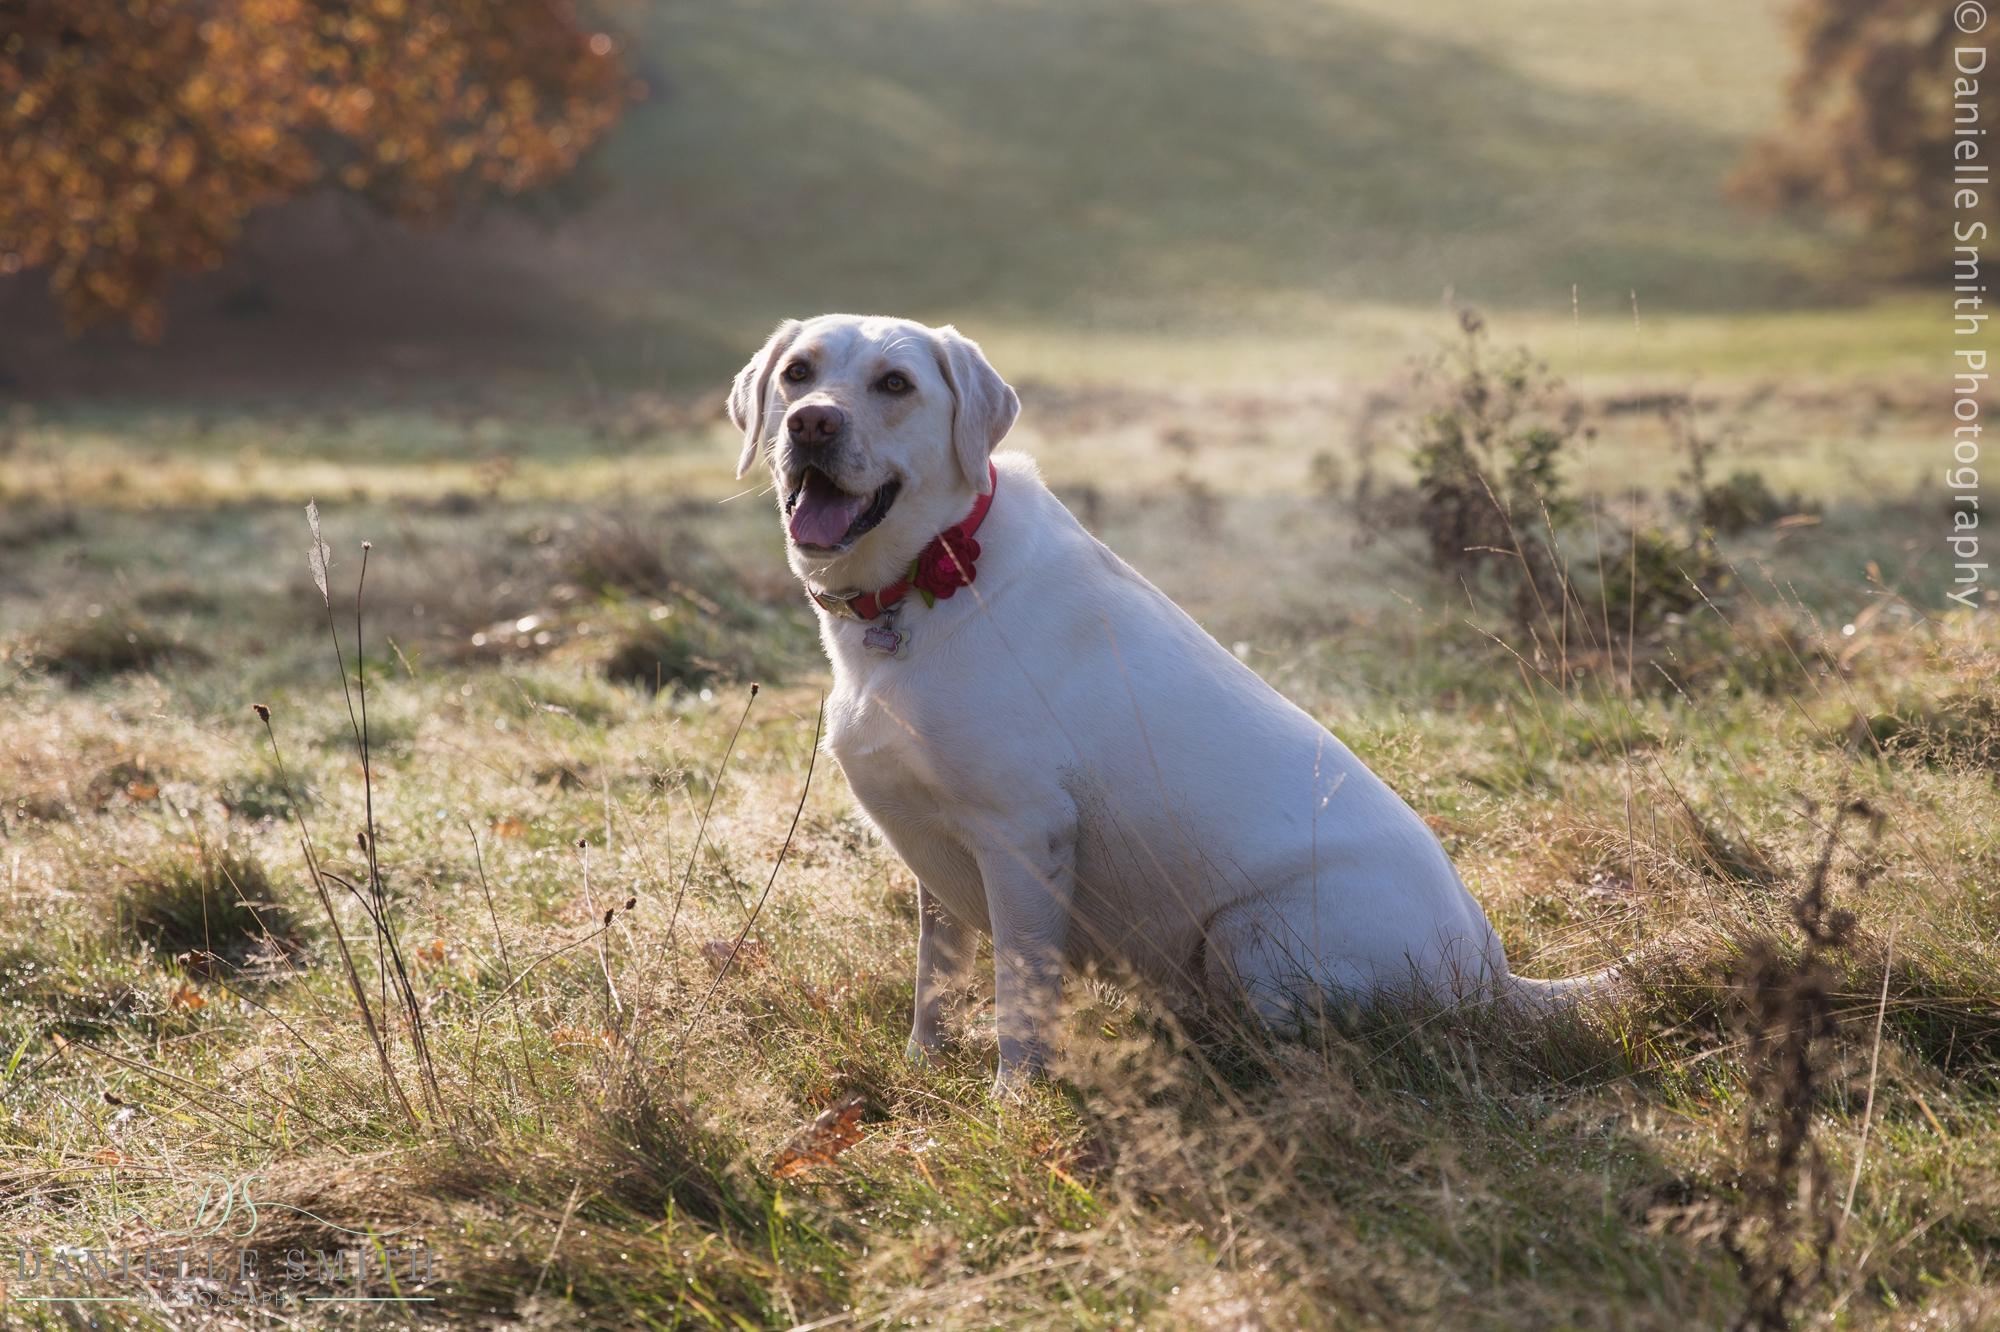 dog sitting in field - dog photos